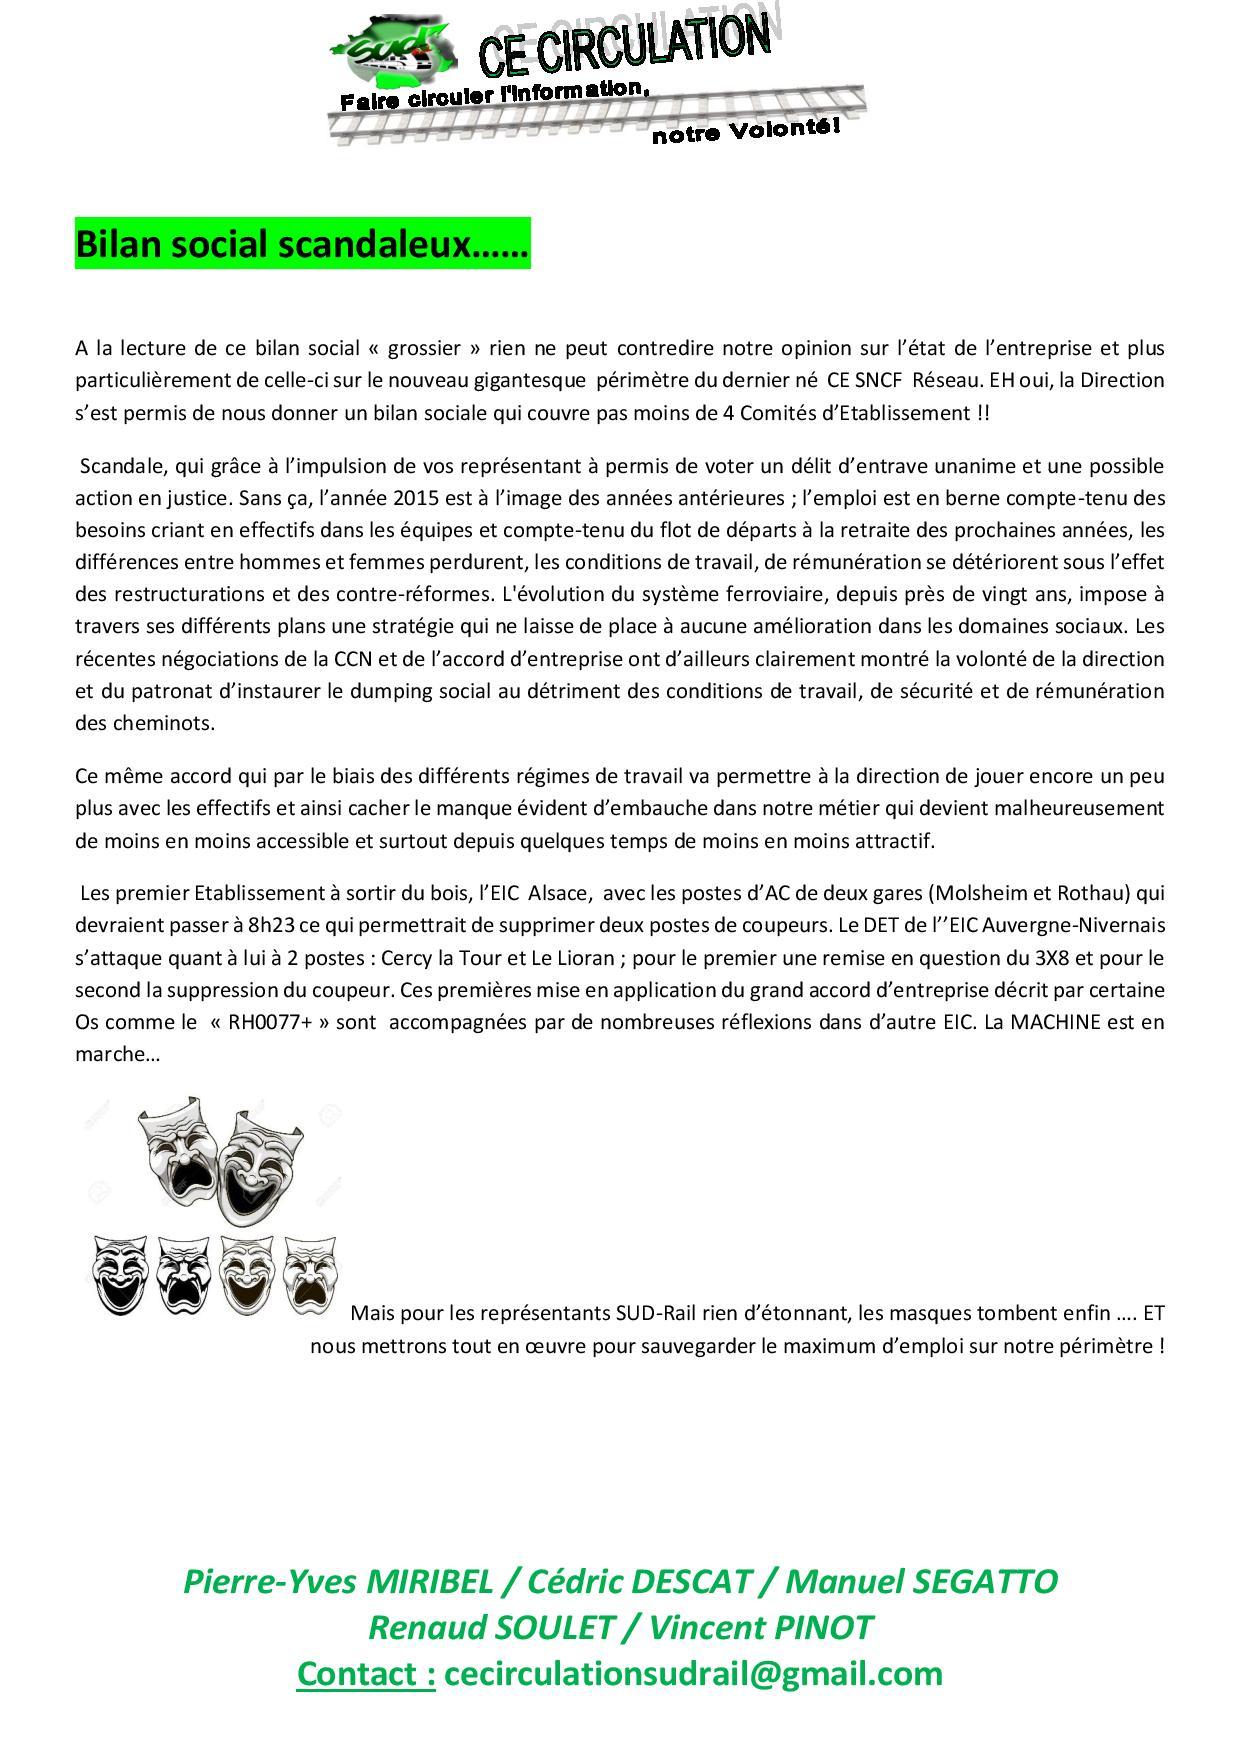 cr-ce-circulation-10-2016-page-003